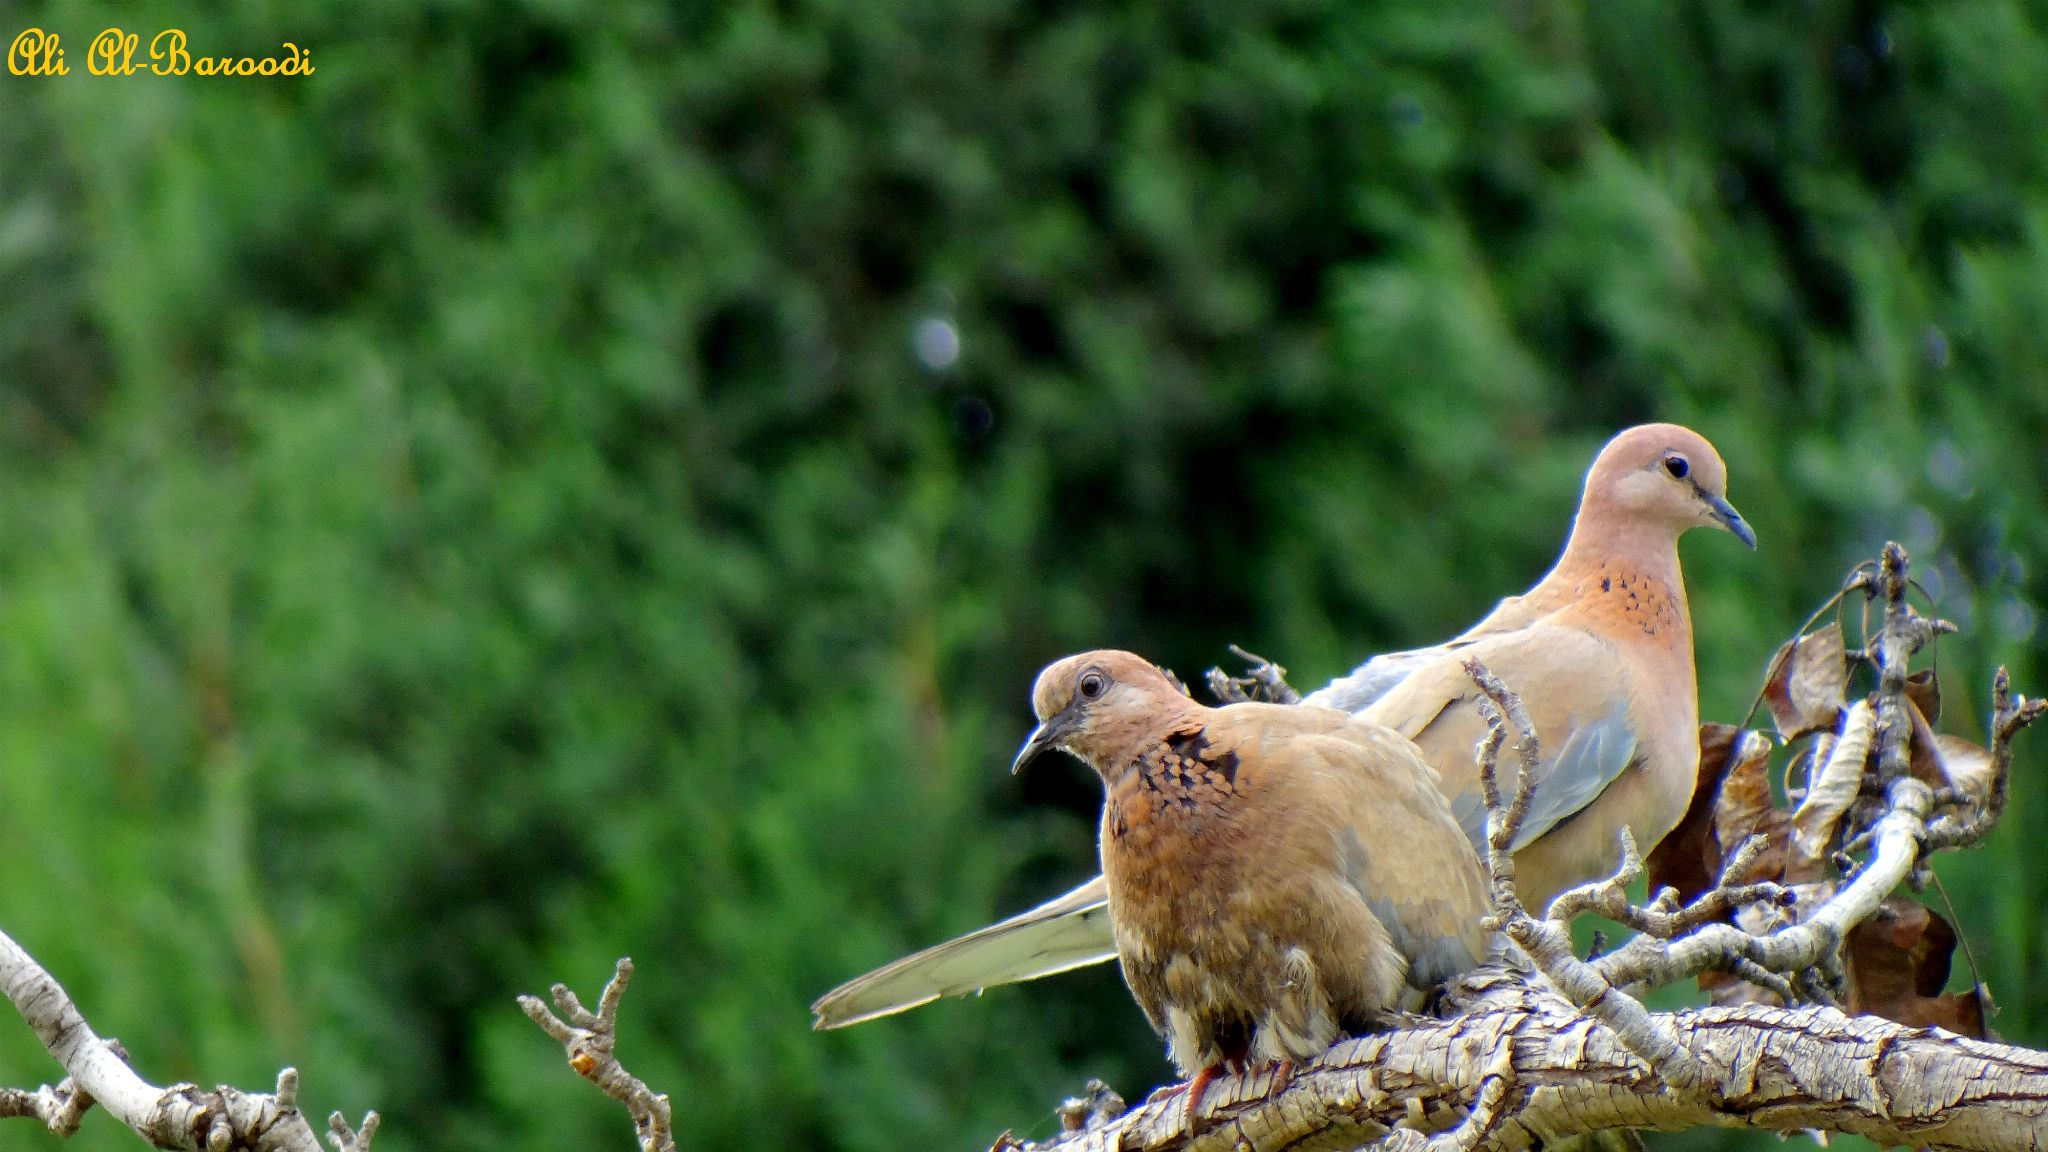 Pigeons in Love -2- by AliAlBaroodi